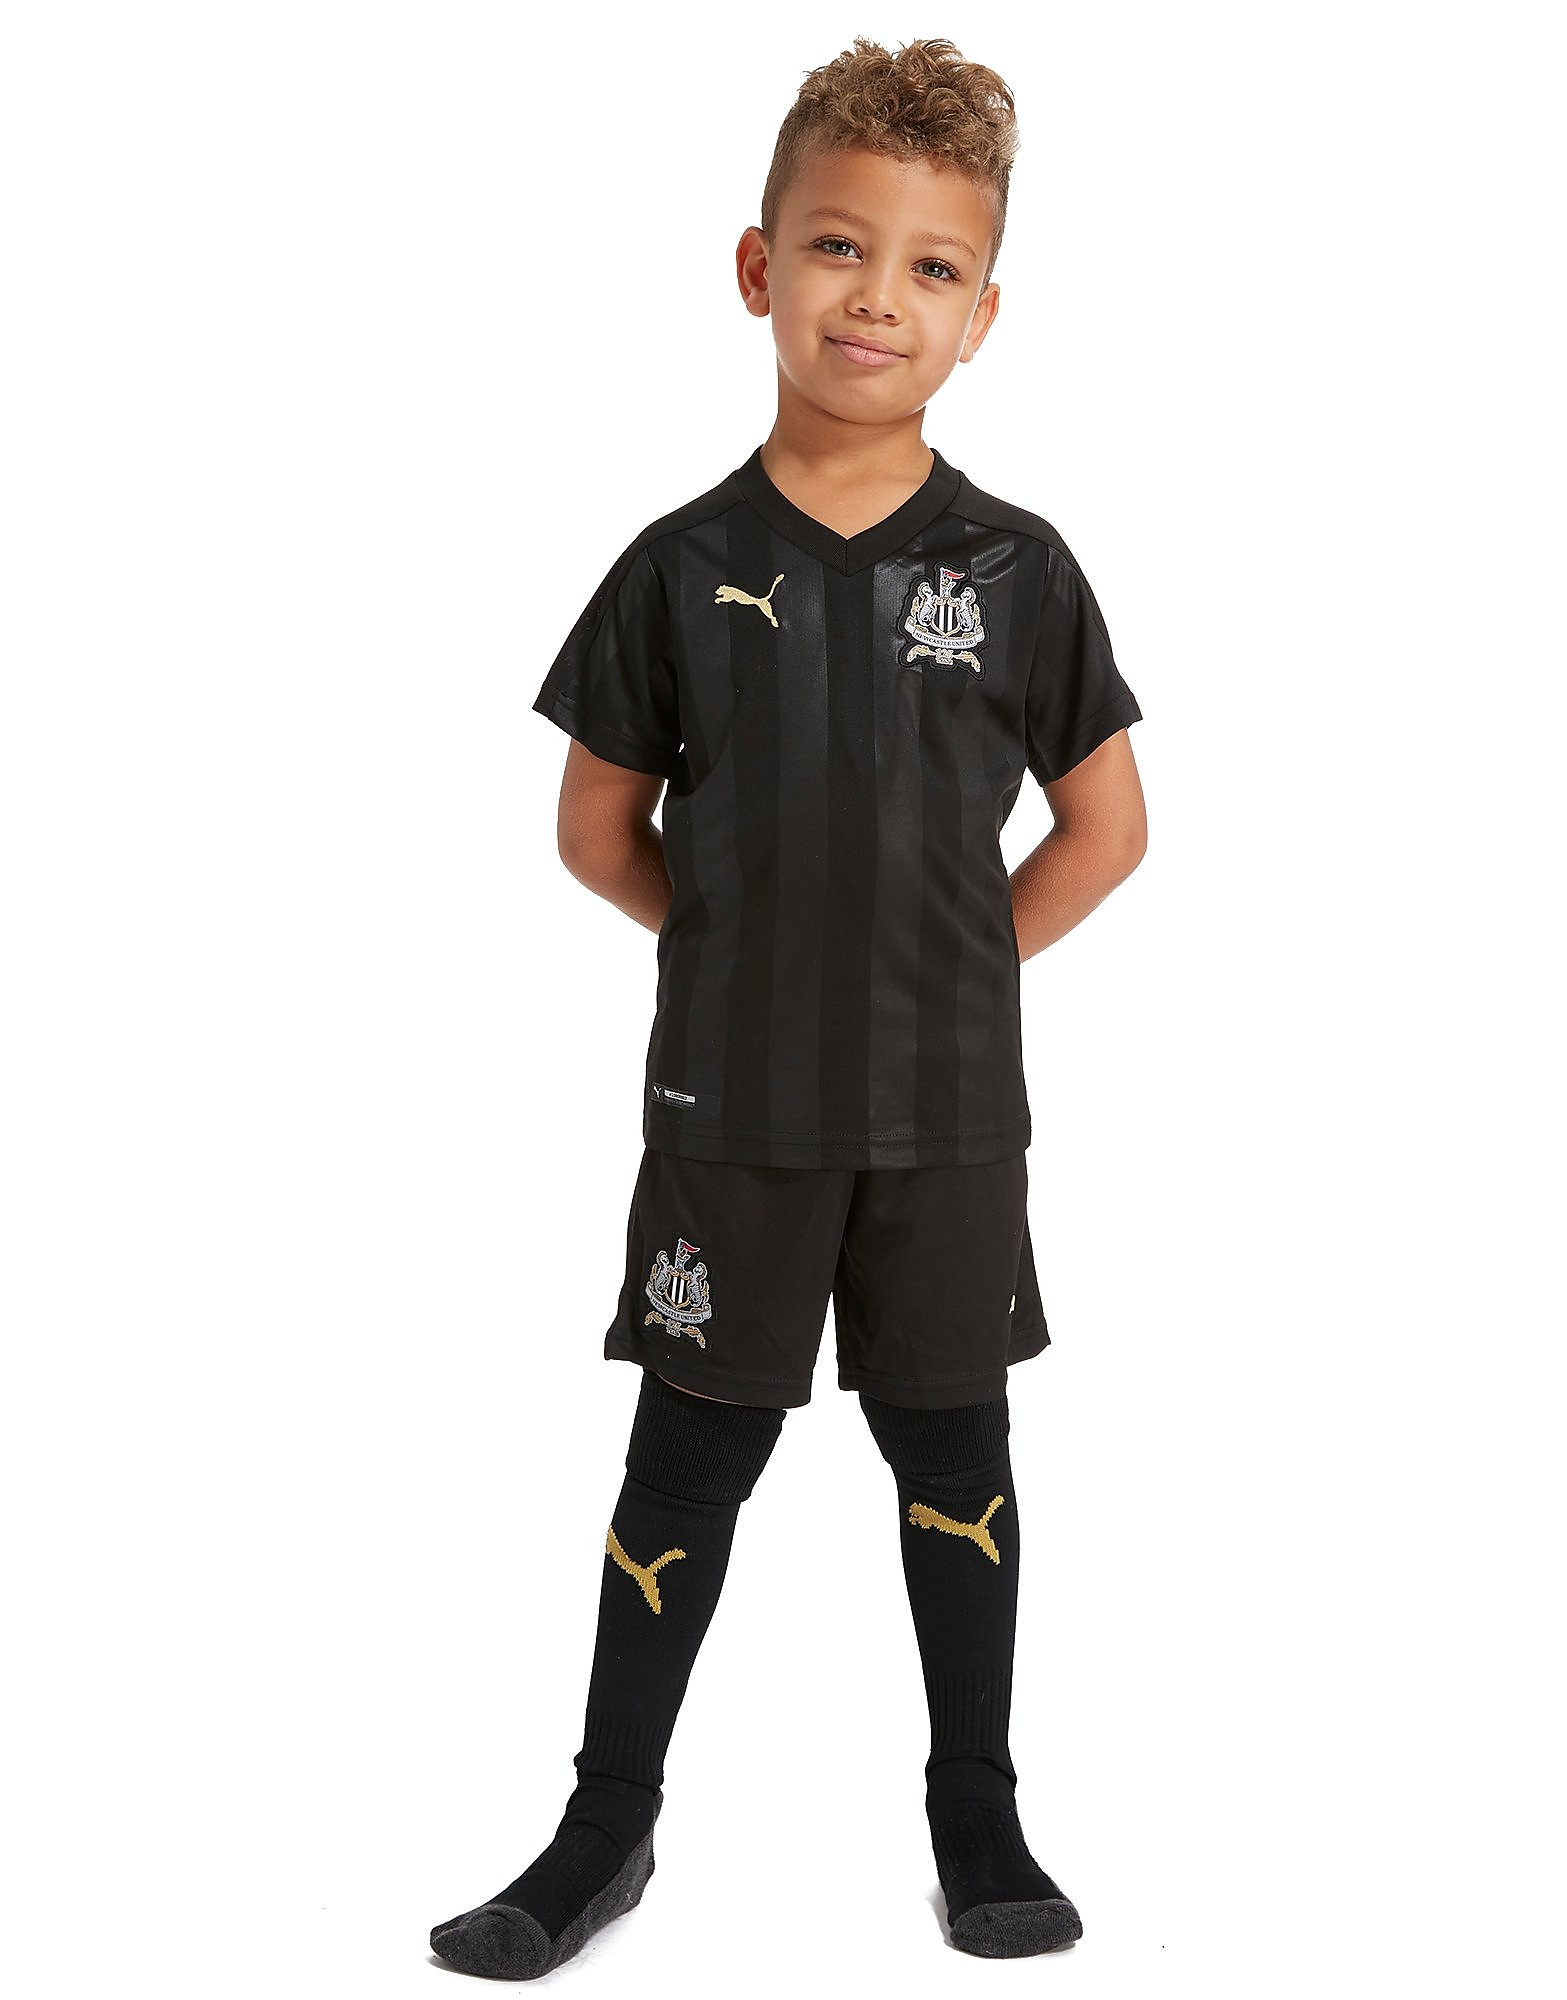 PUMA Newcastle United 2017/18 Third Kit Childrens